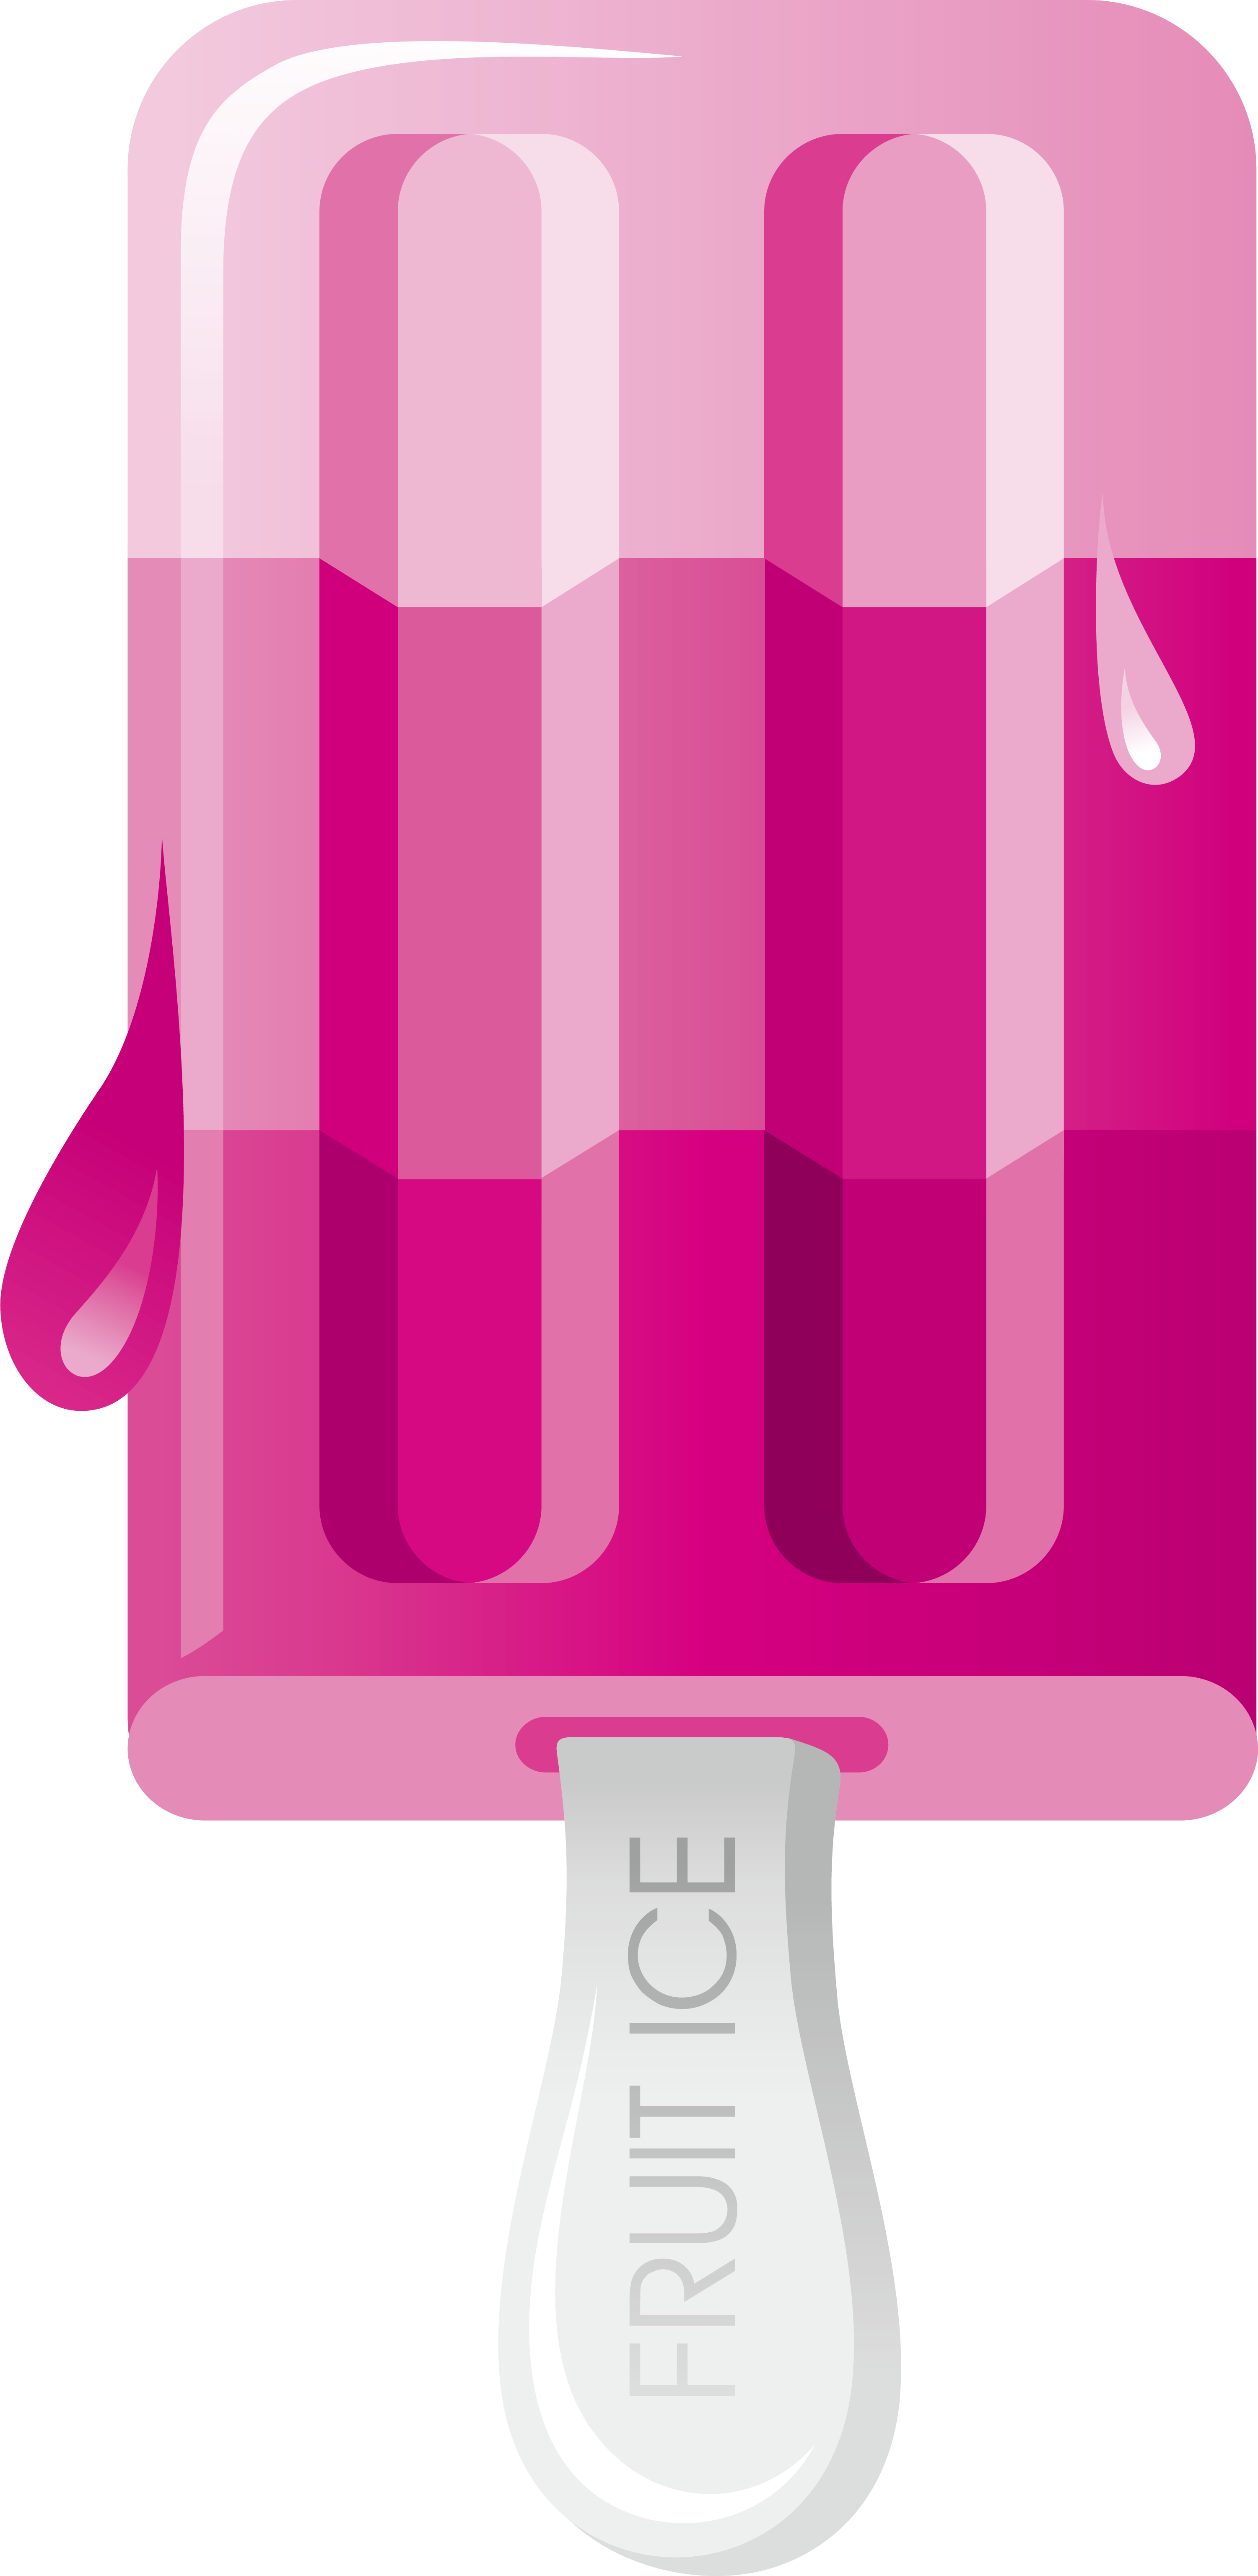 Ice cream computer file. Icecream clipart purple